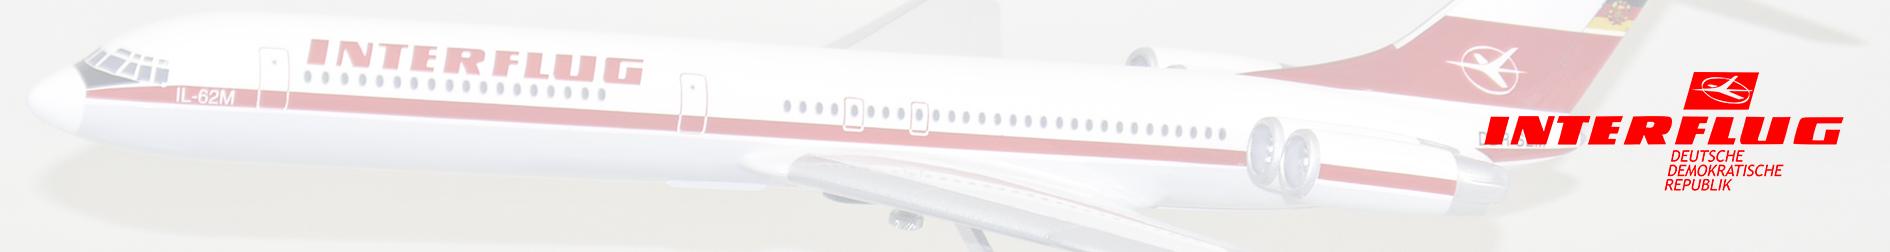 interflug.jpg